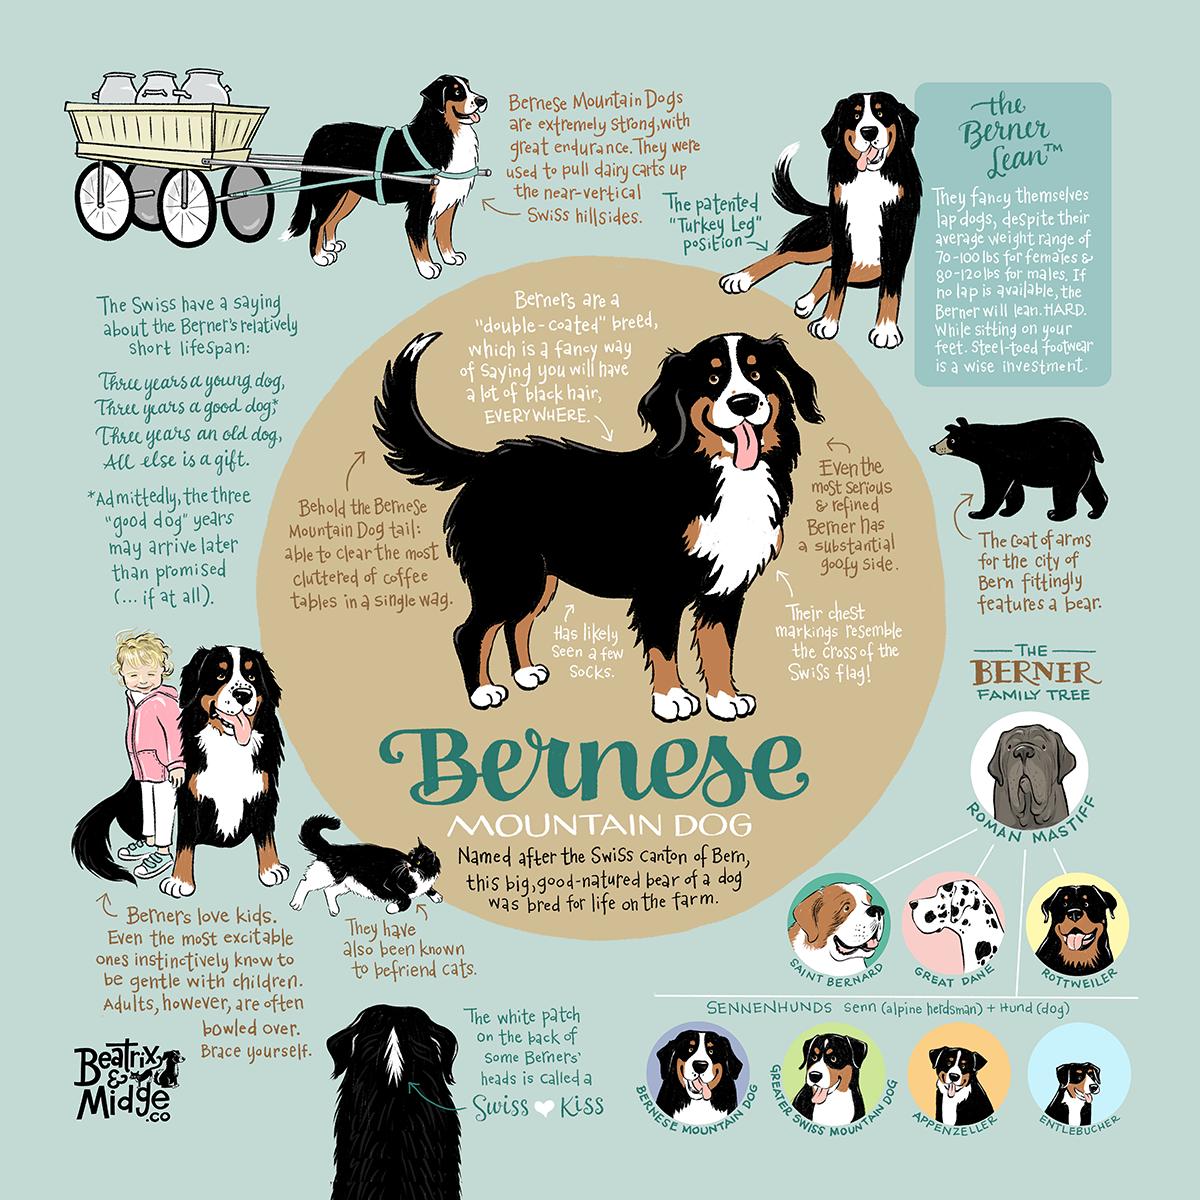 Infographic for my business  Beatrix & Midge Co .